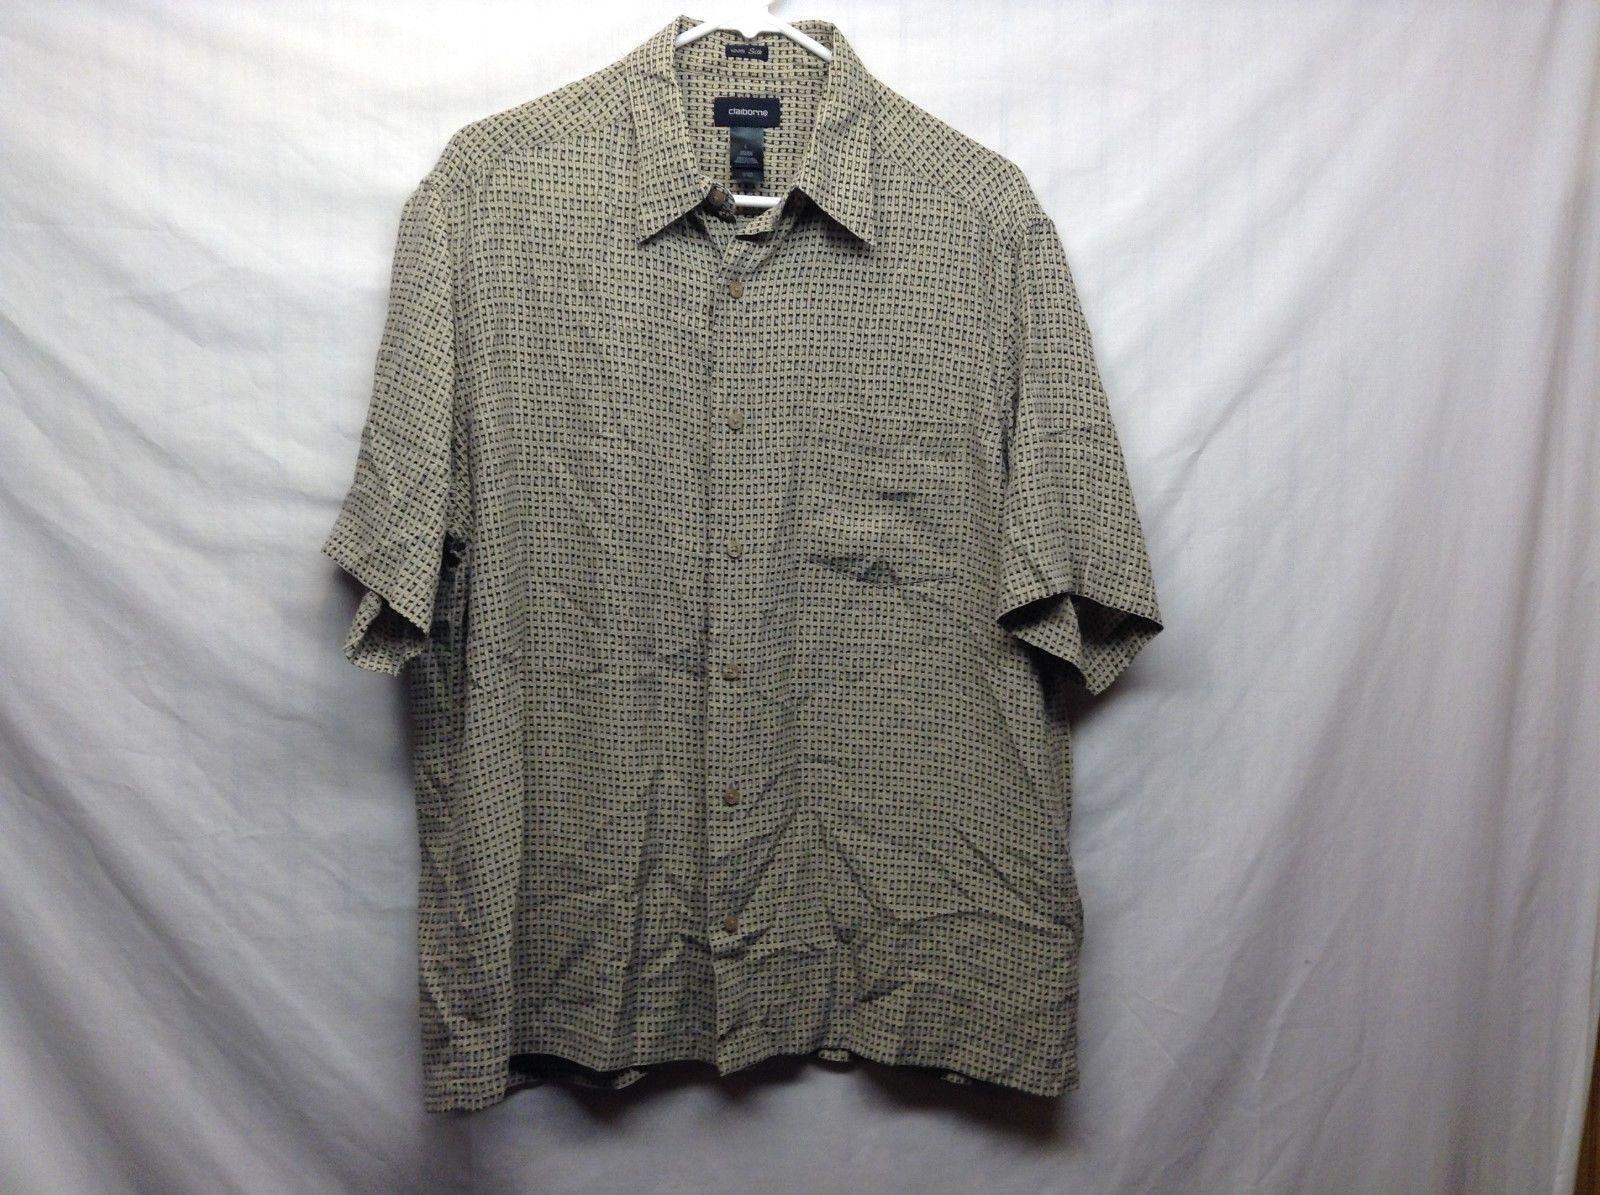 Claiborne Beige/Black Casual Short Sleeve Silk Shirt Sz LG